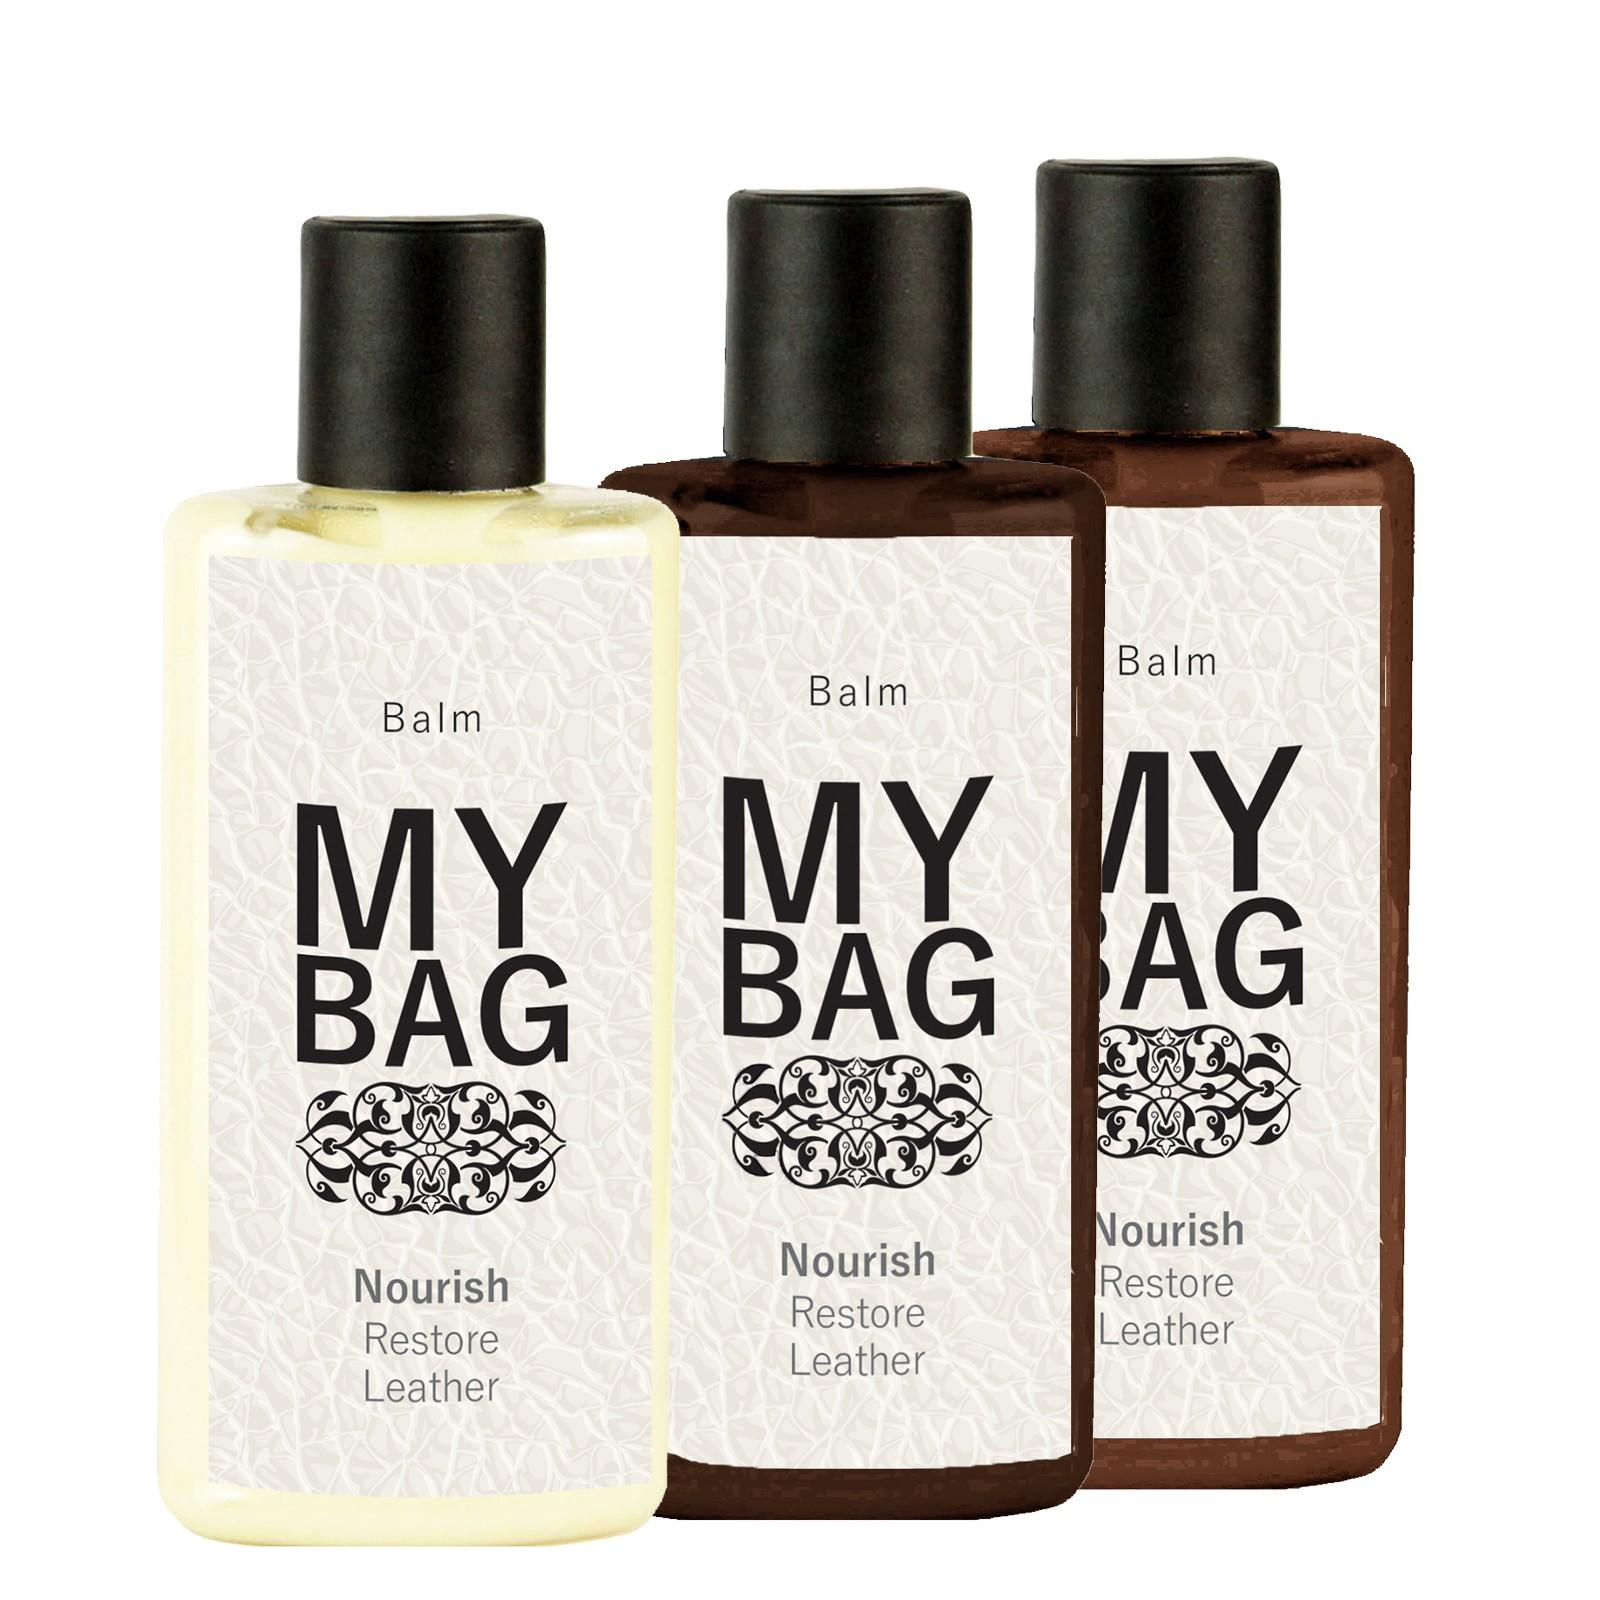 My Bag Spa Nourishing Balm